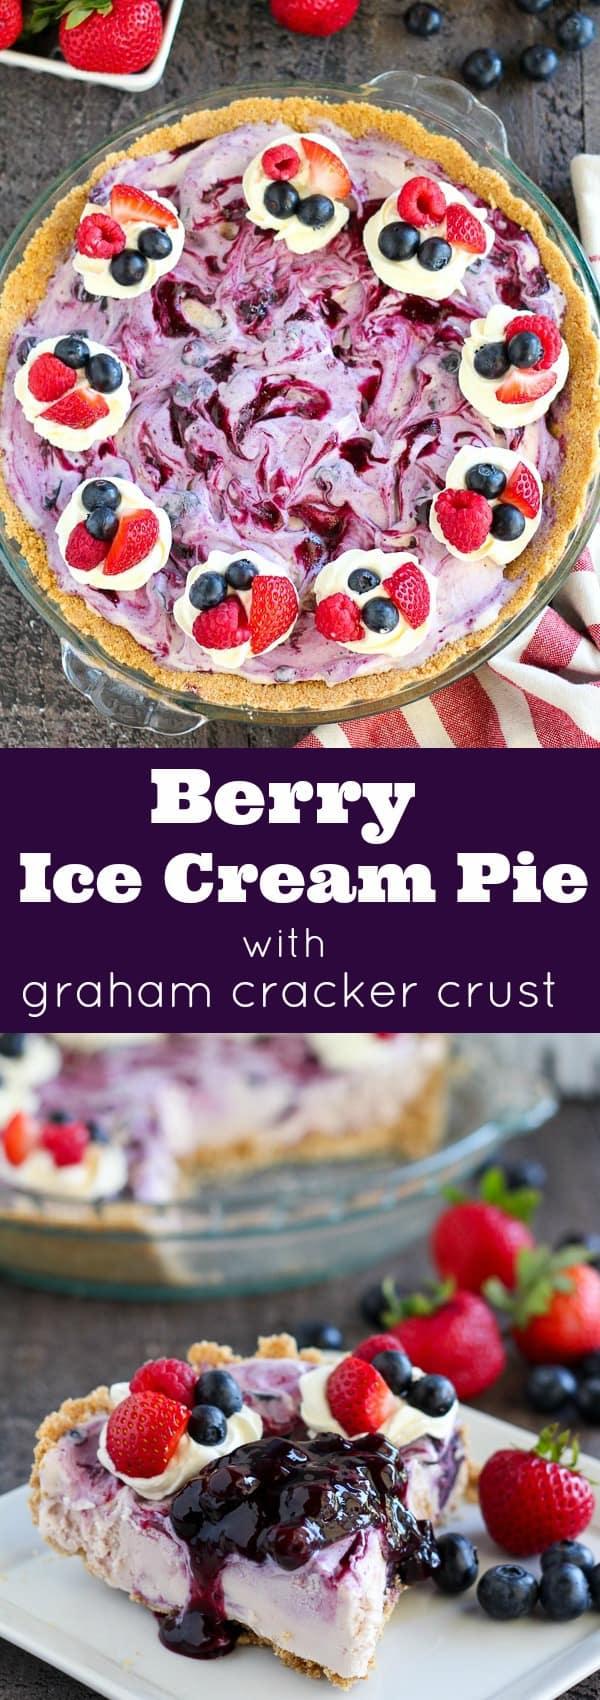 Berry Ice Cream Pie with Graham Cracker Crust